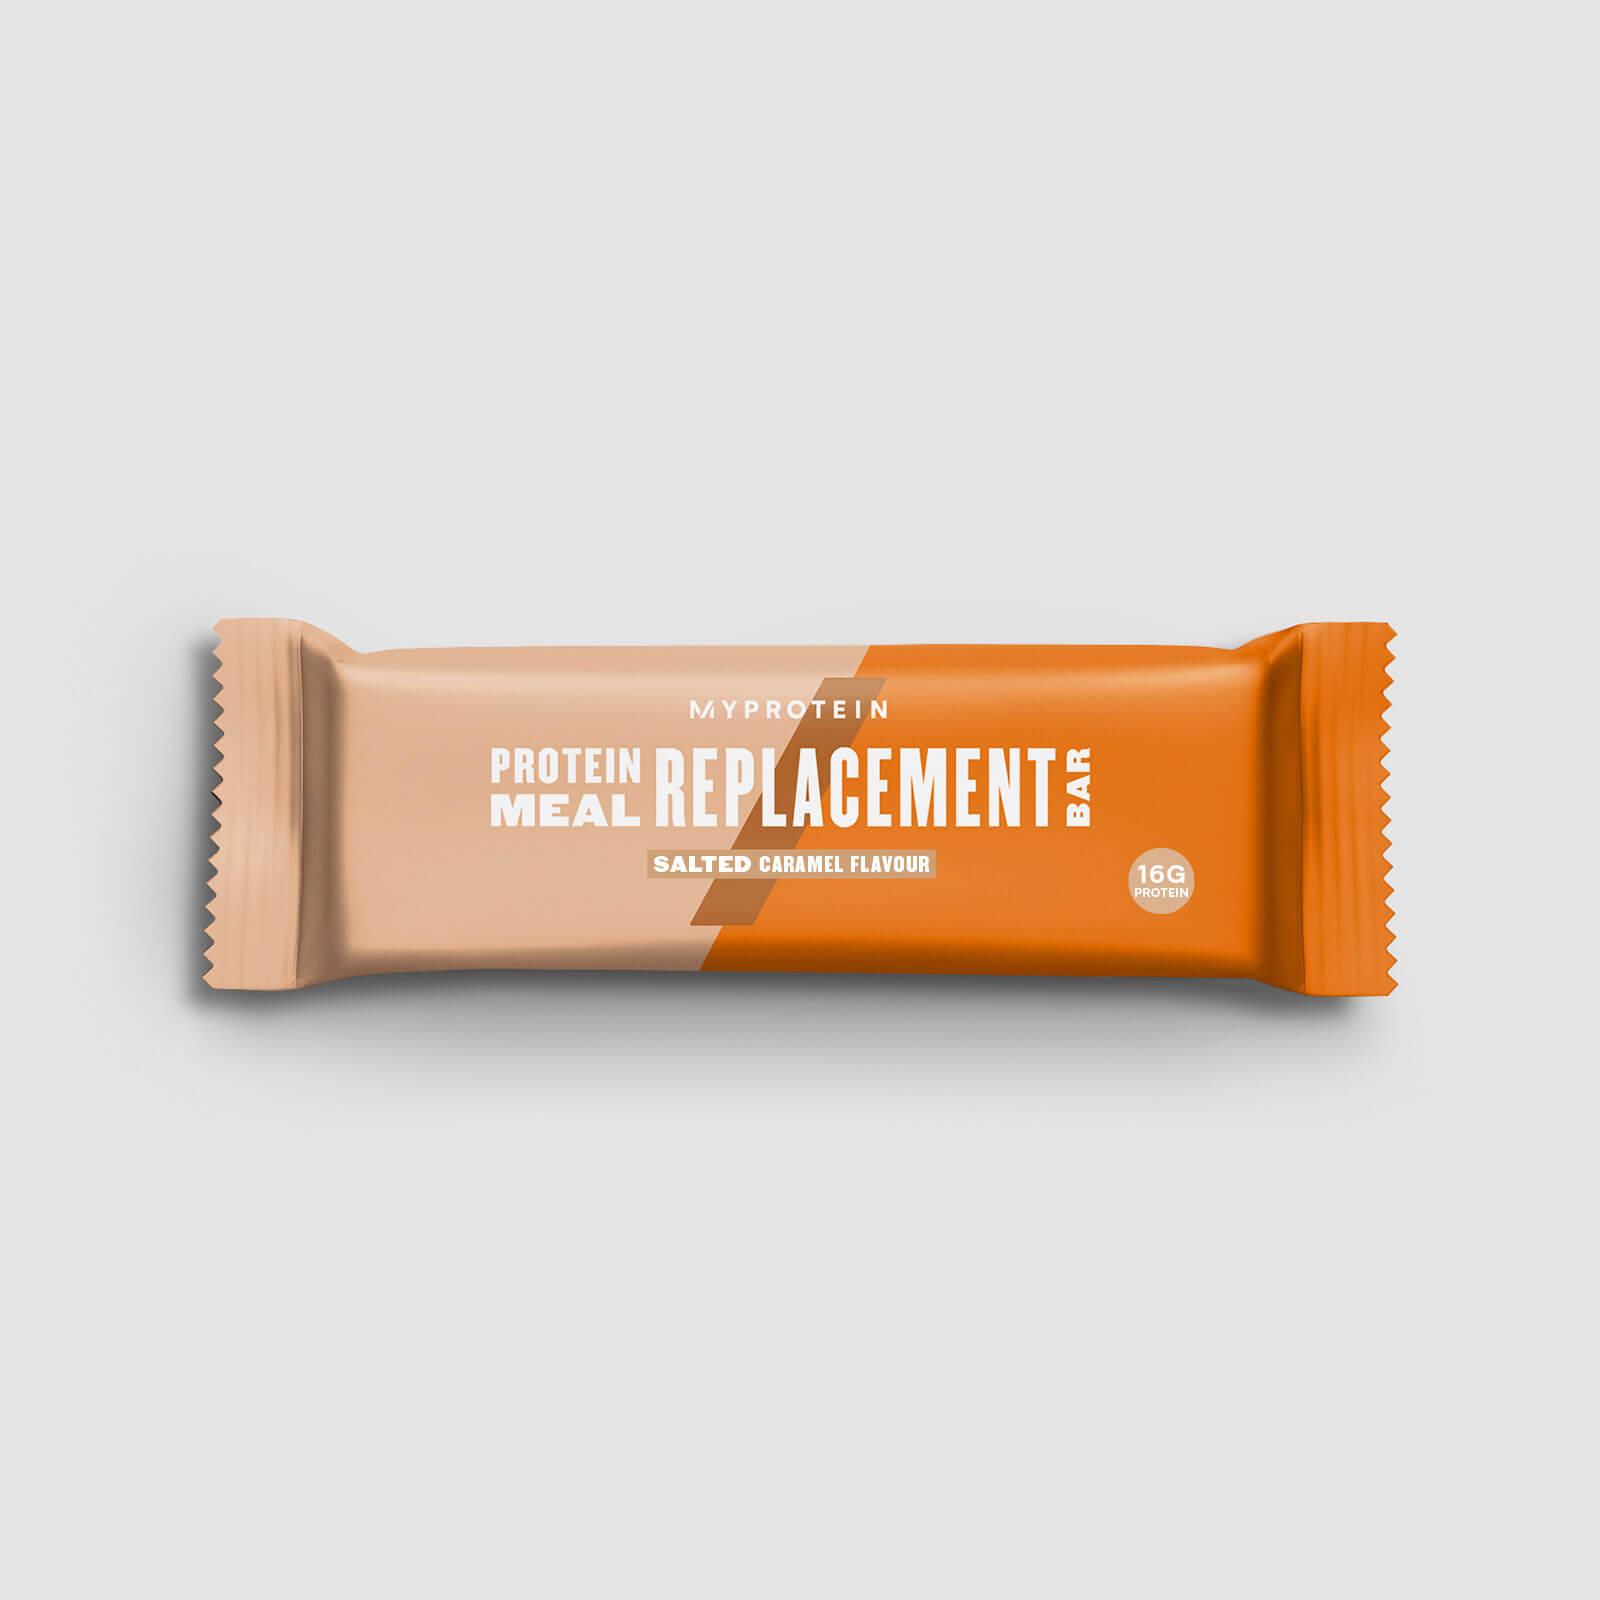 Myprotein Meal Replacement Bar (Sample) - 60g - Nouveau - Caramel salé